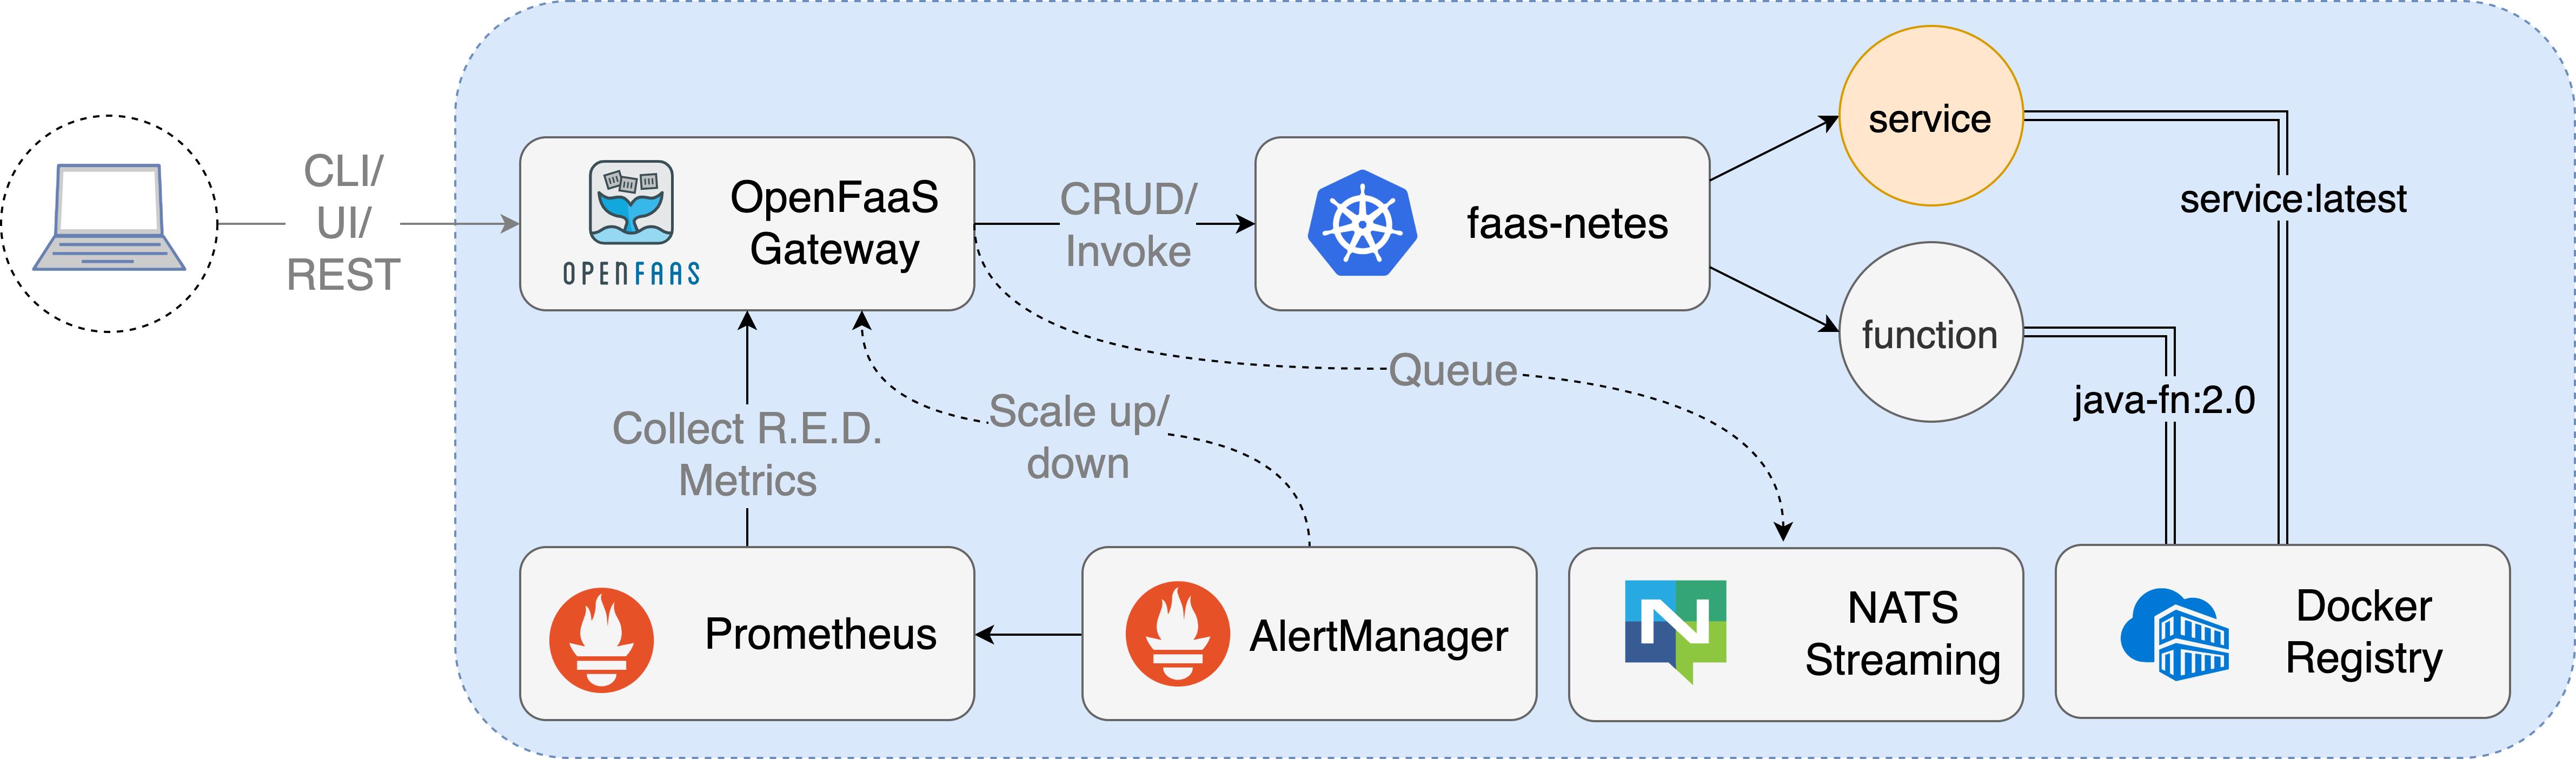 OpenFaaS workflow